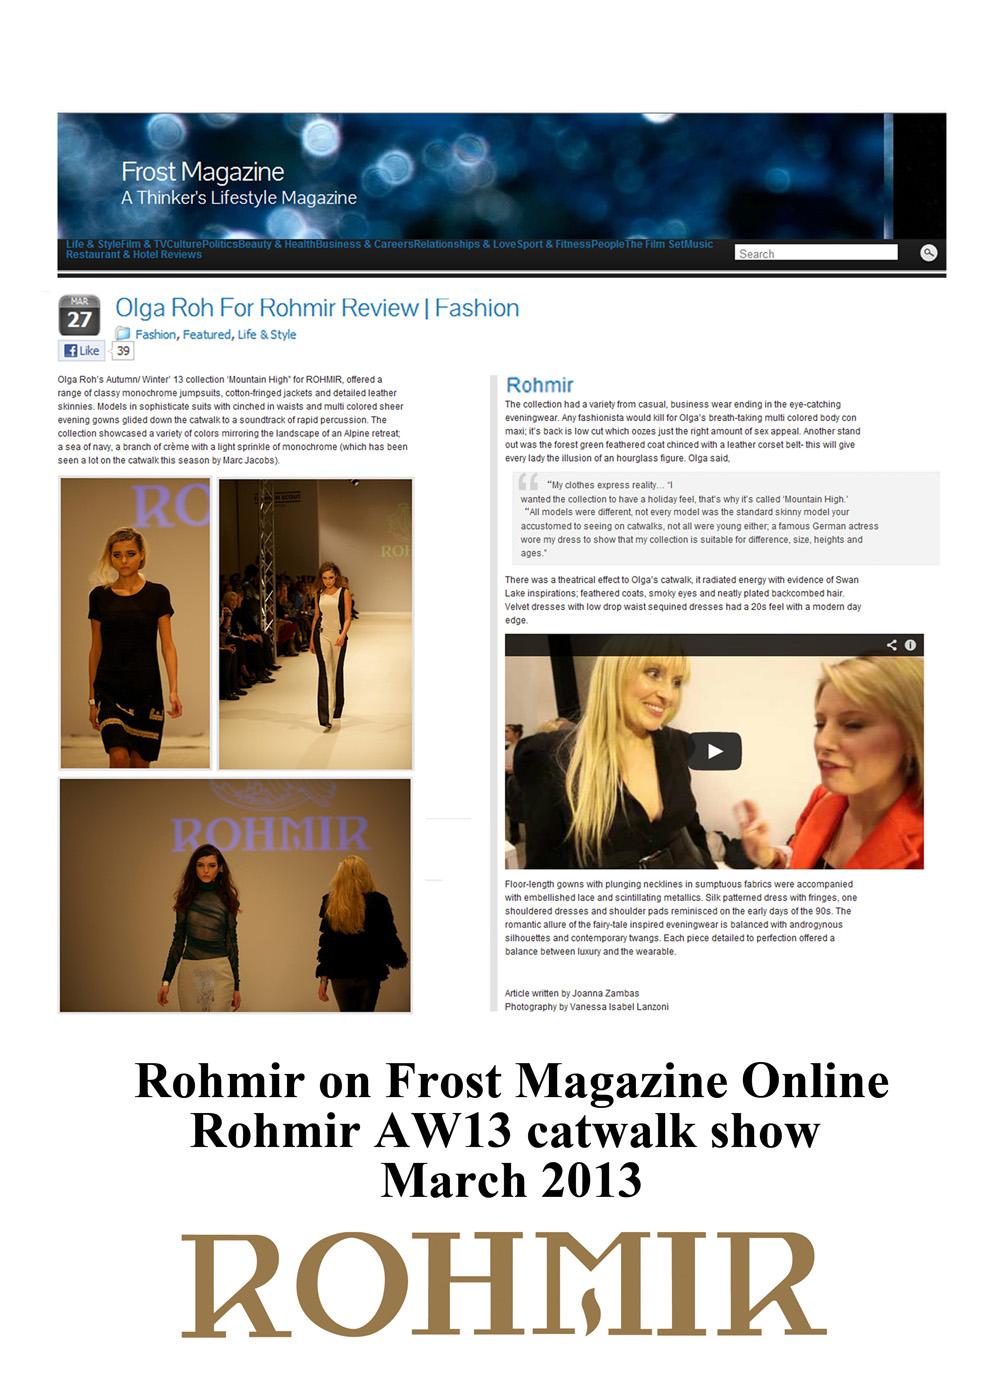 Rohmir on Frost Magazine Online Rohmir AW13 catwalk show Mar 2013